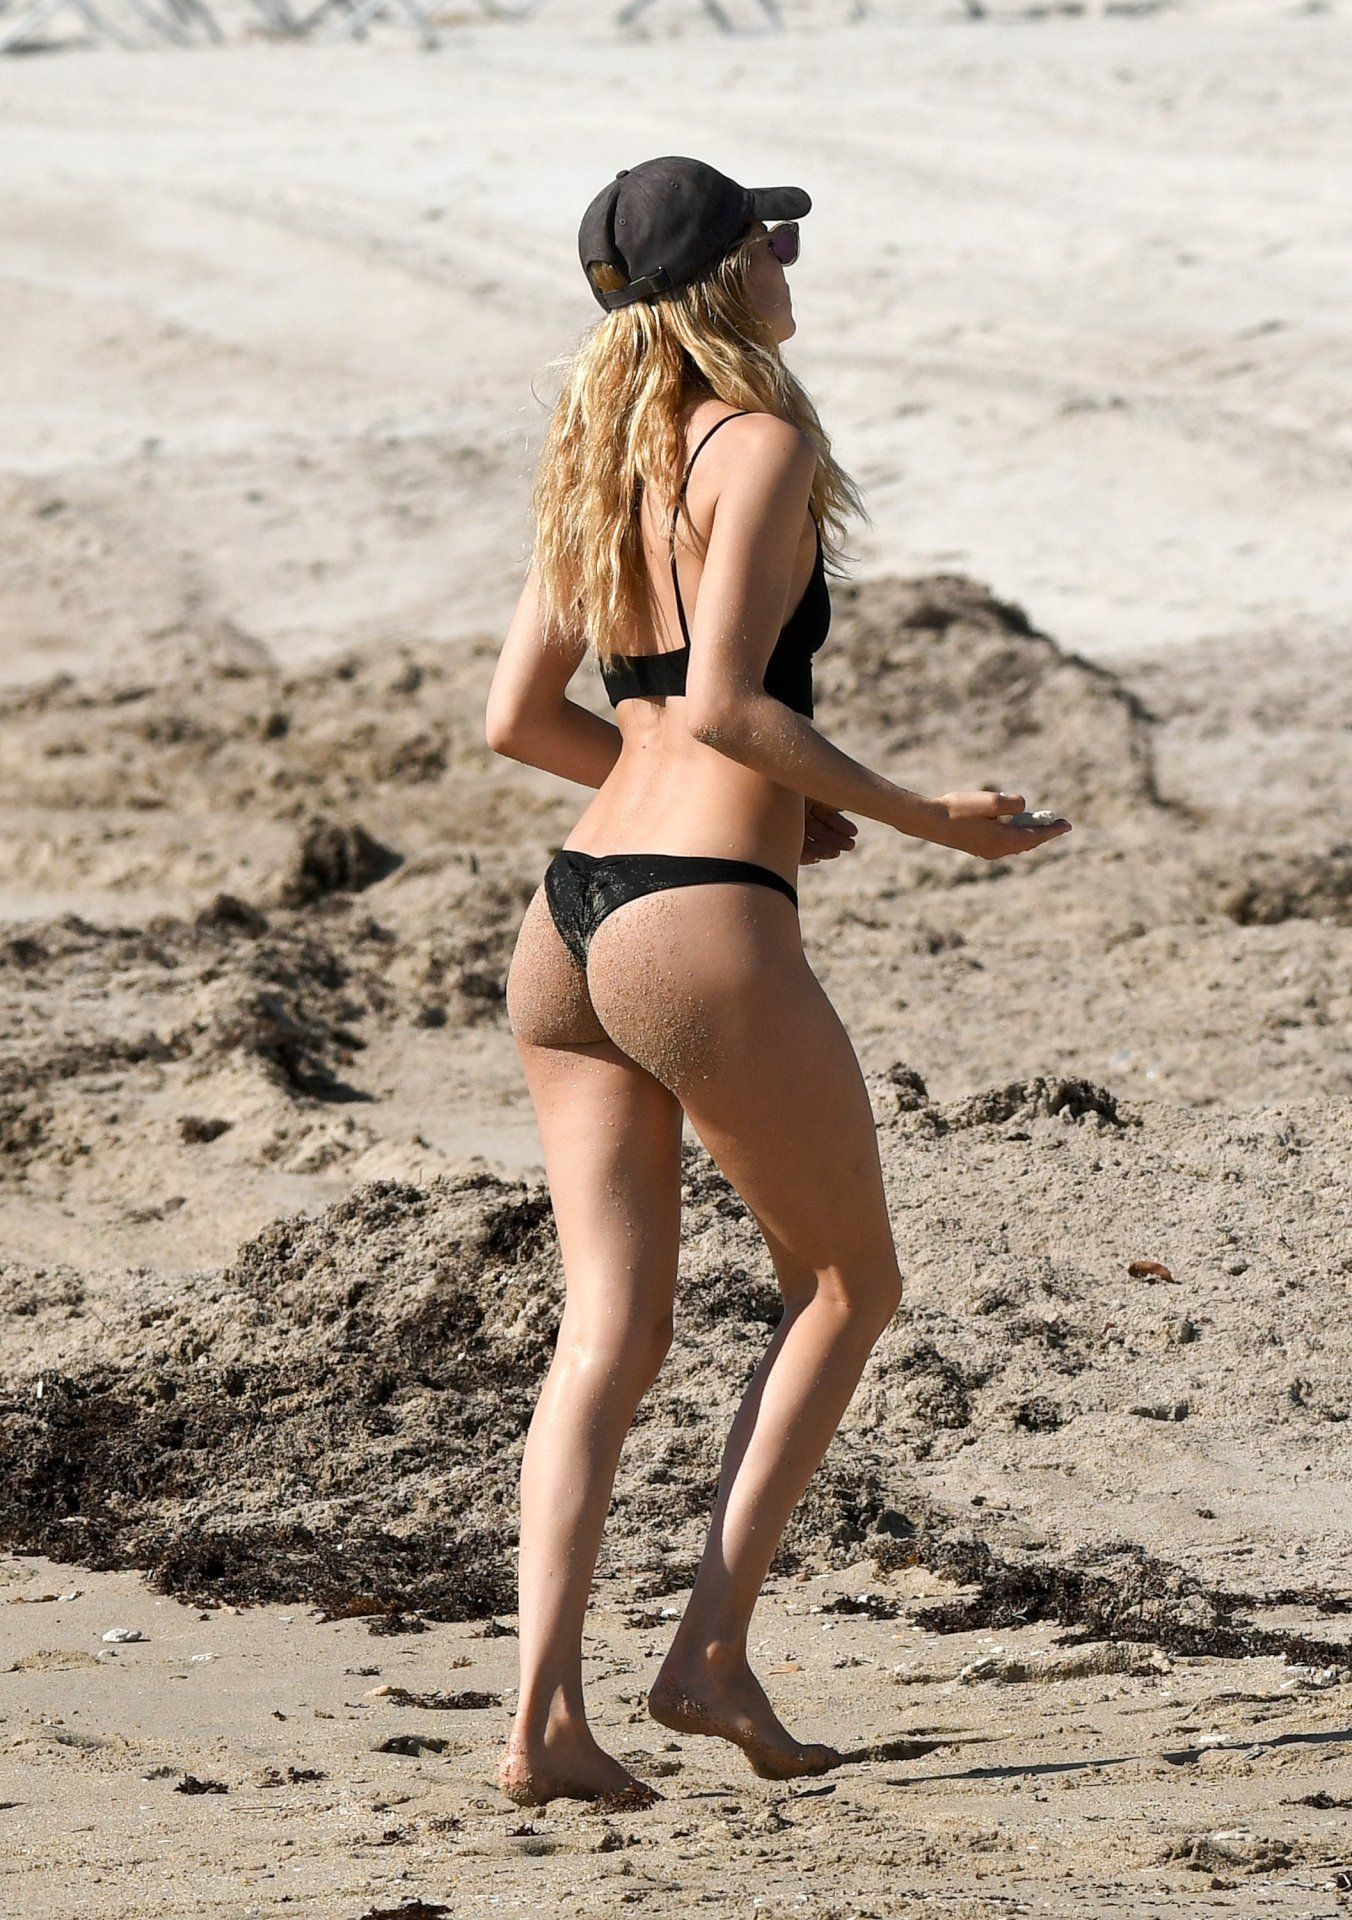 Sasha Grey Porn picture Blake lively4,Odette Annable Sexy - 7 Photos